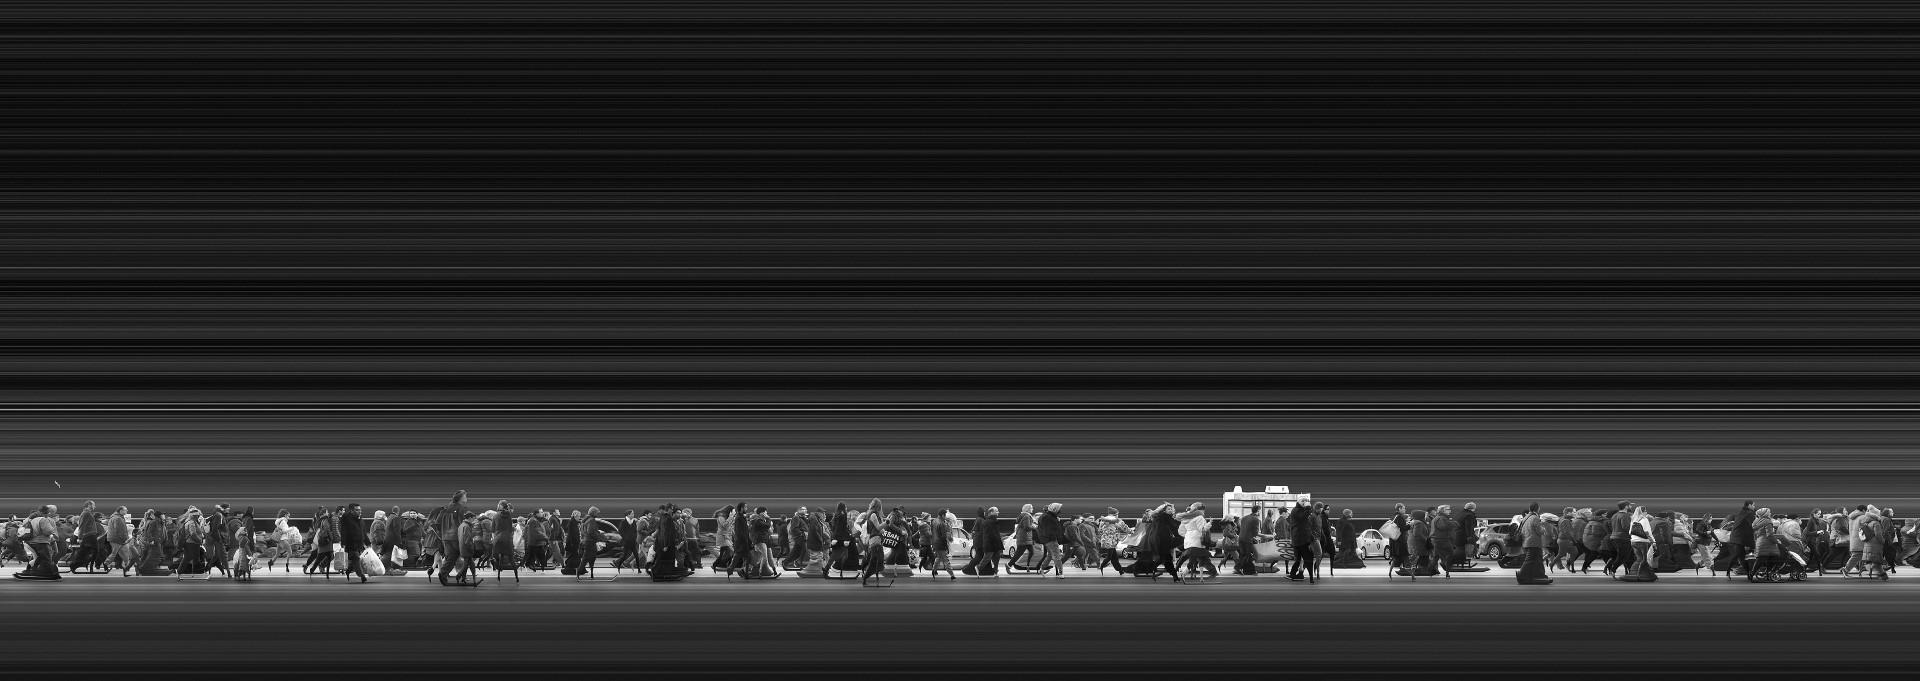 Fotó: Magyar Ádám, Urban Flow 1837 (New York) (Urban Flow sorozat) I Urban Flow 1837 (New York) (Urban Flow series), 2015 © Magyar Ádám/ Courtesy of Faur Zsófi Galéria